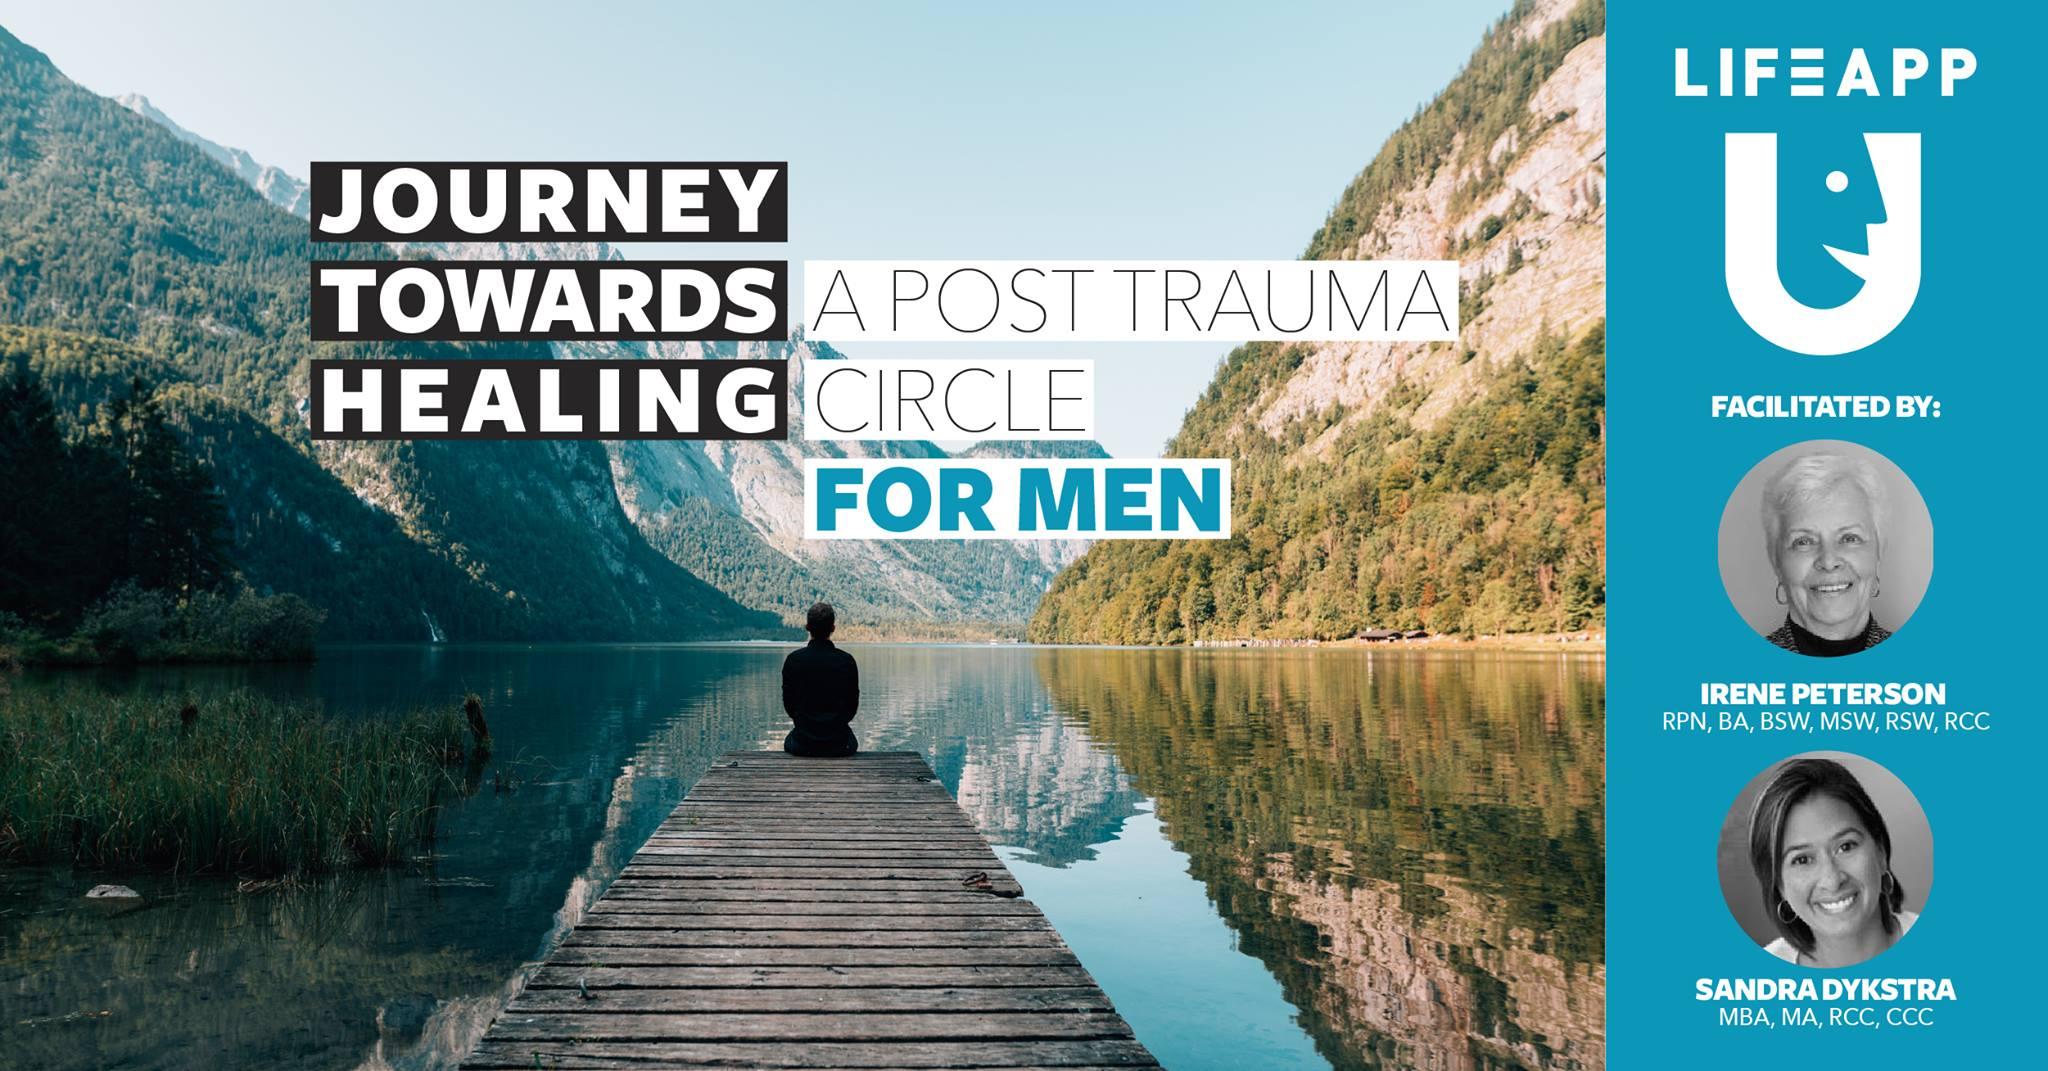 JourneyTowardsHealing_Trauma.jpg